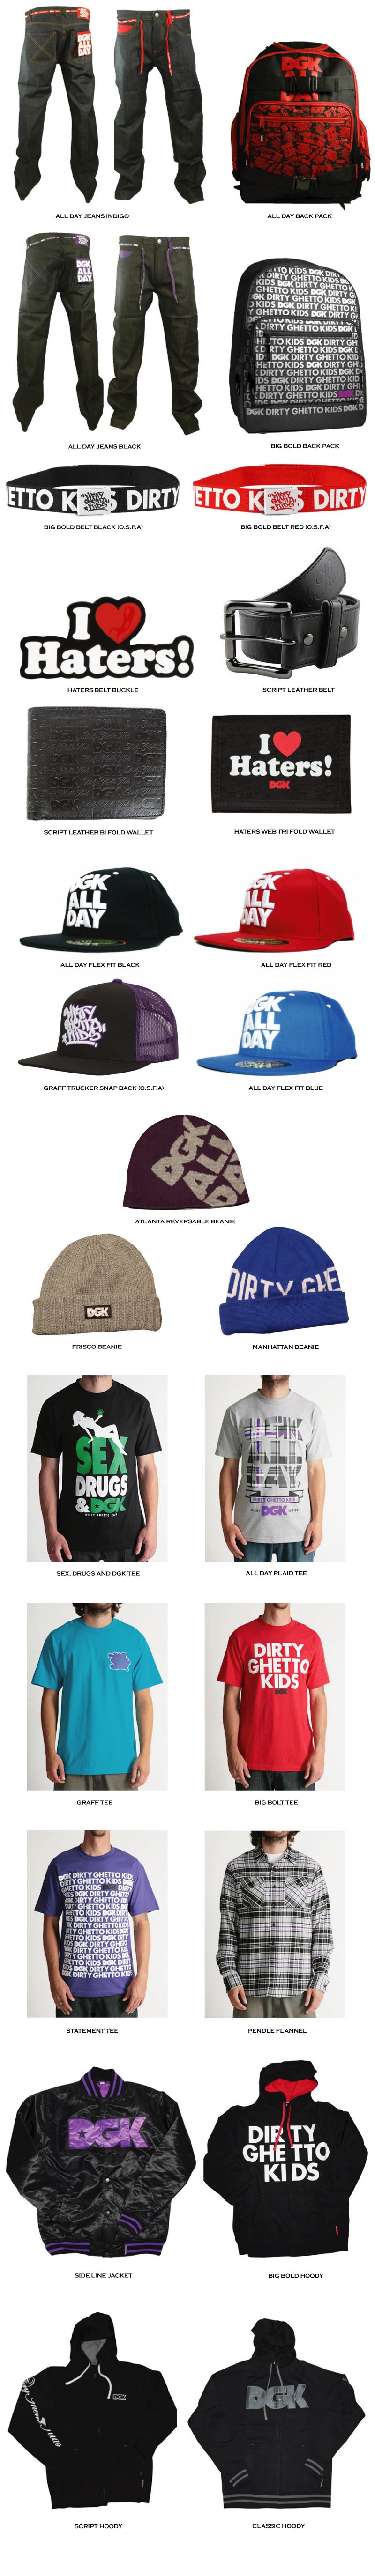 dgk clothing